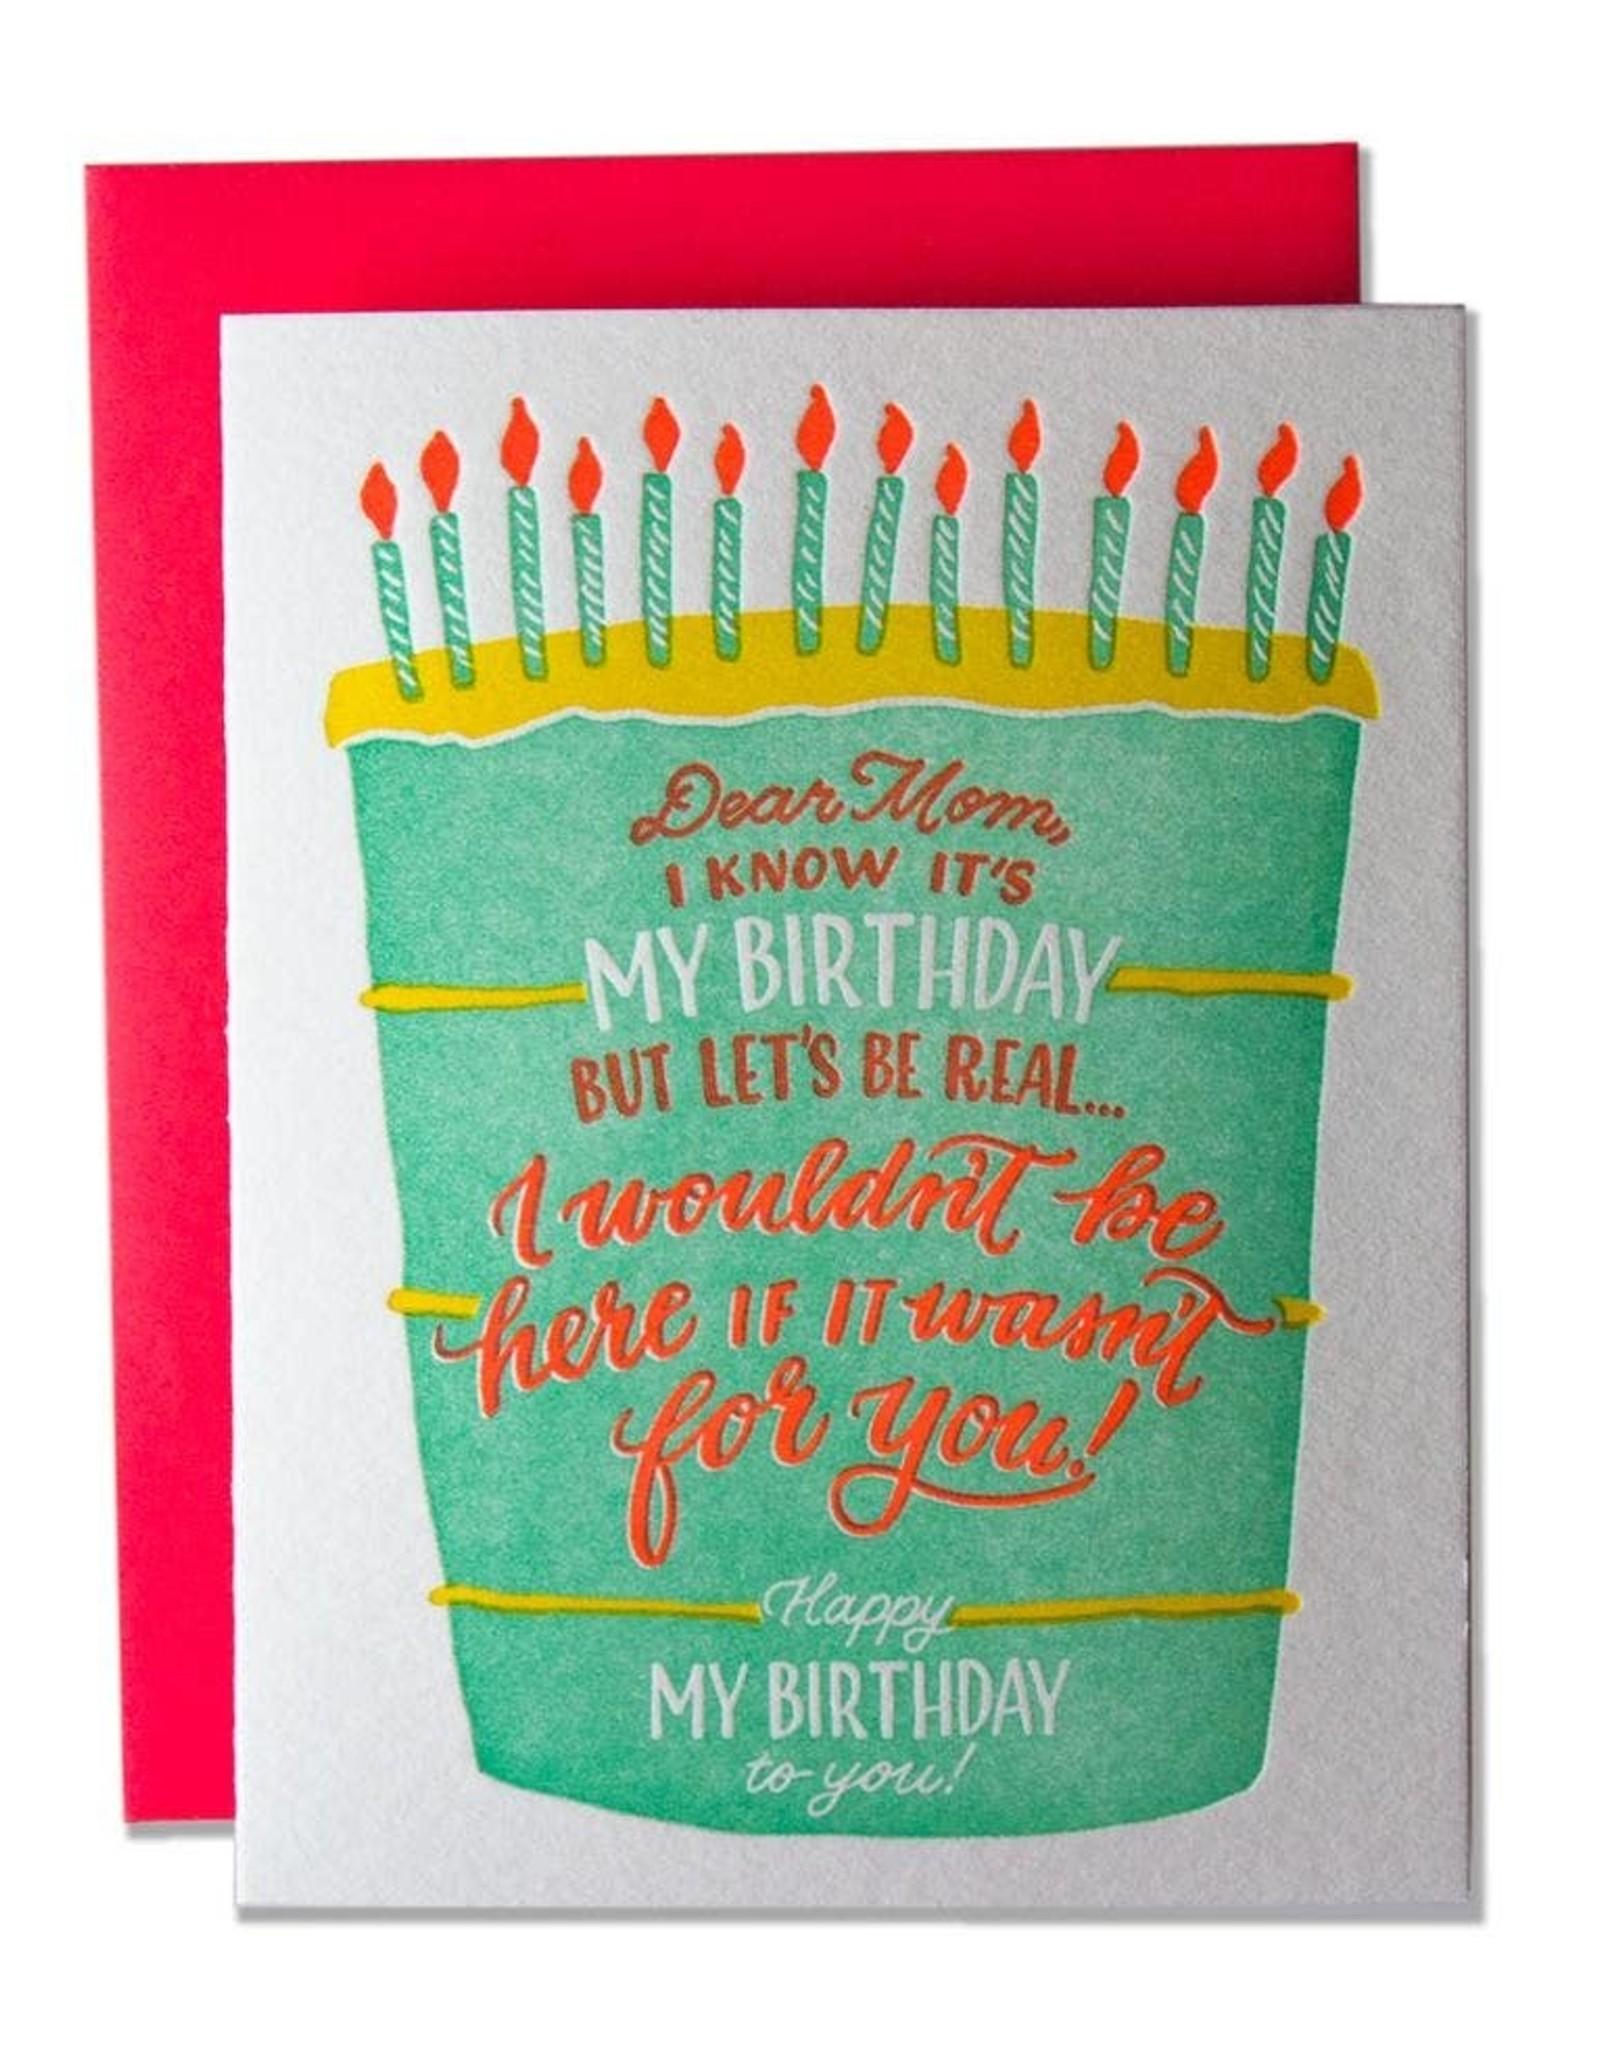 Ladyfingers Letterpress Ladyfingers Letterpress | Dear Mom On My Birthday